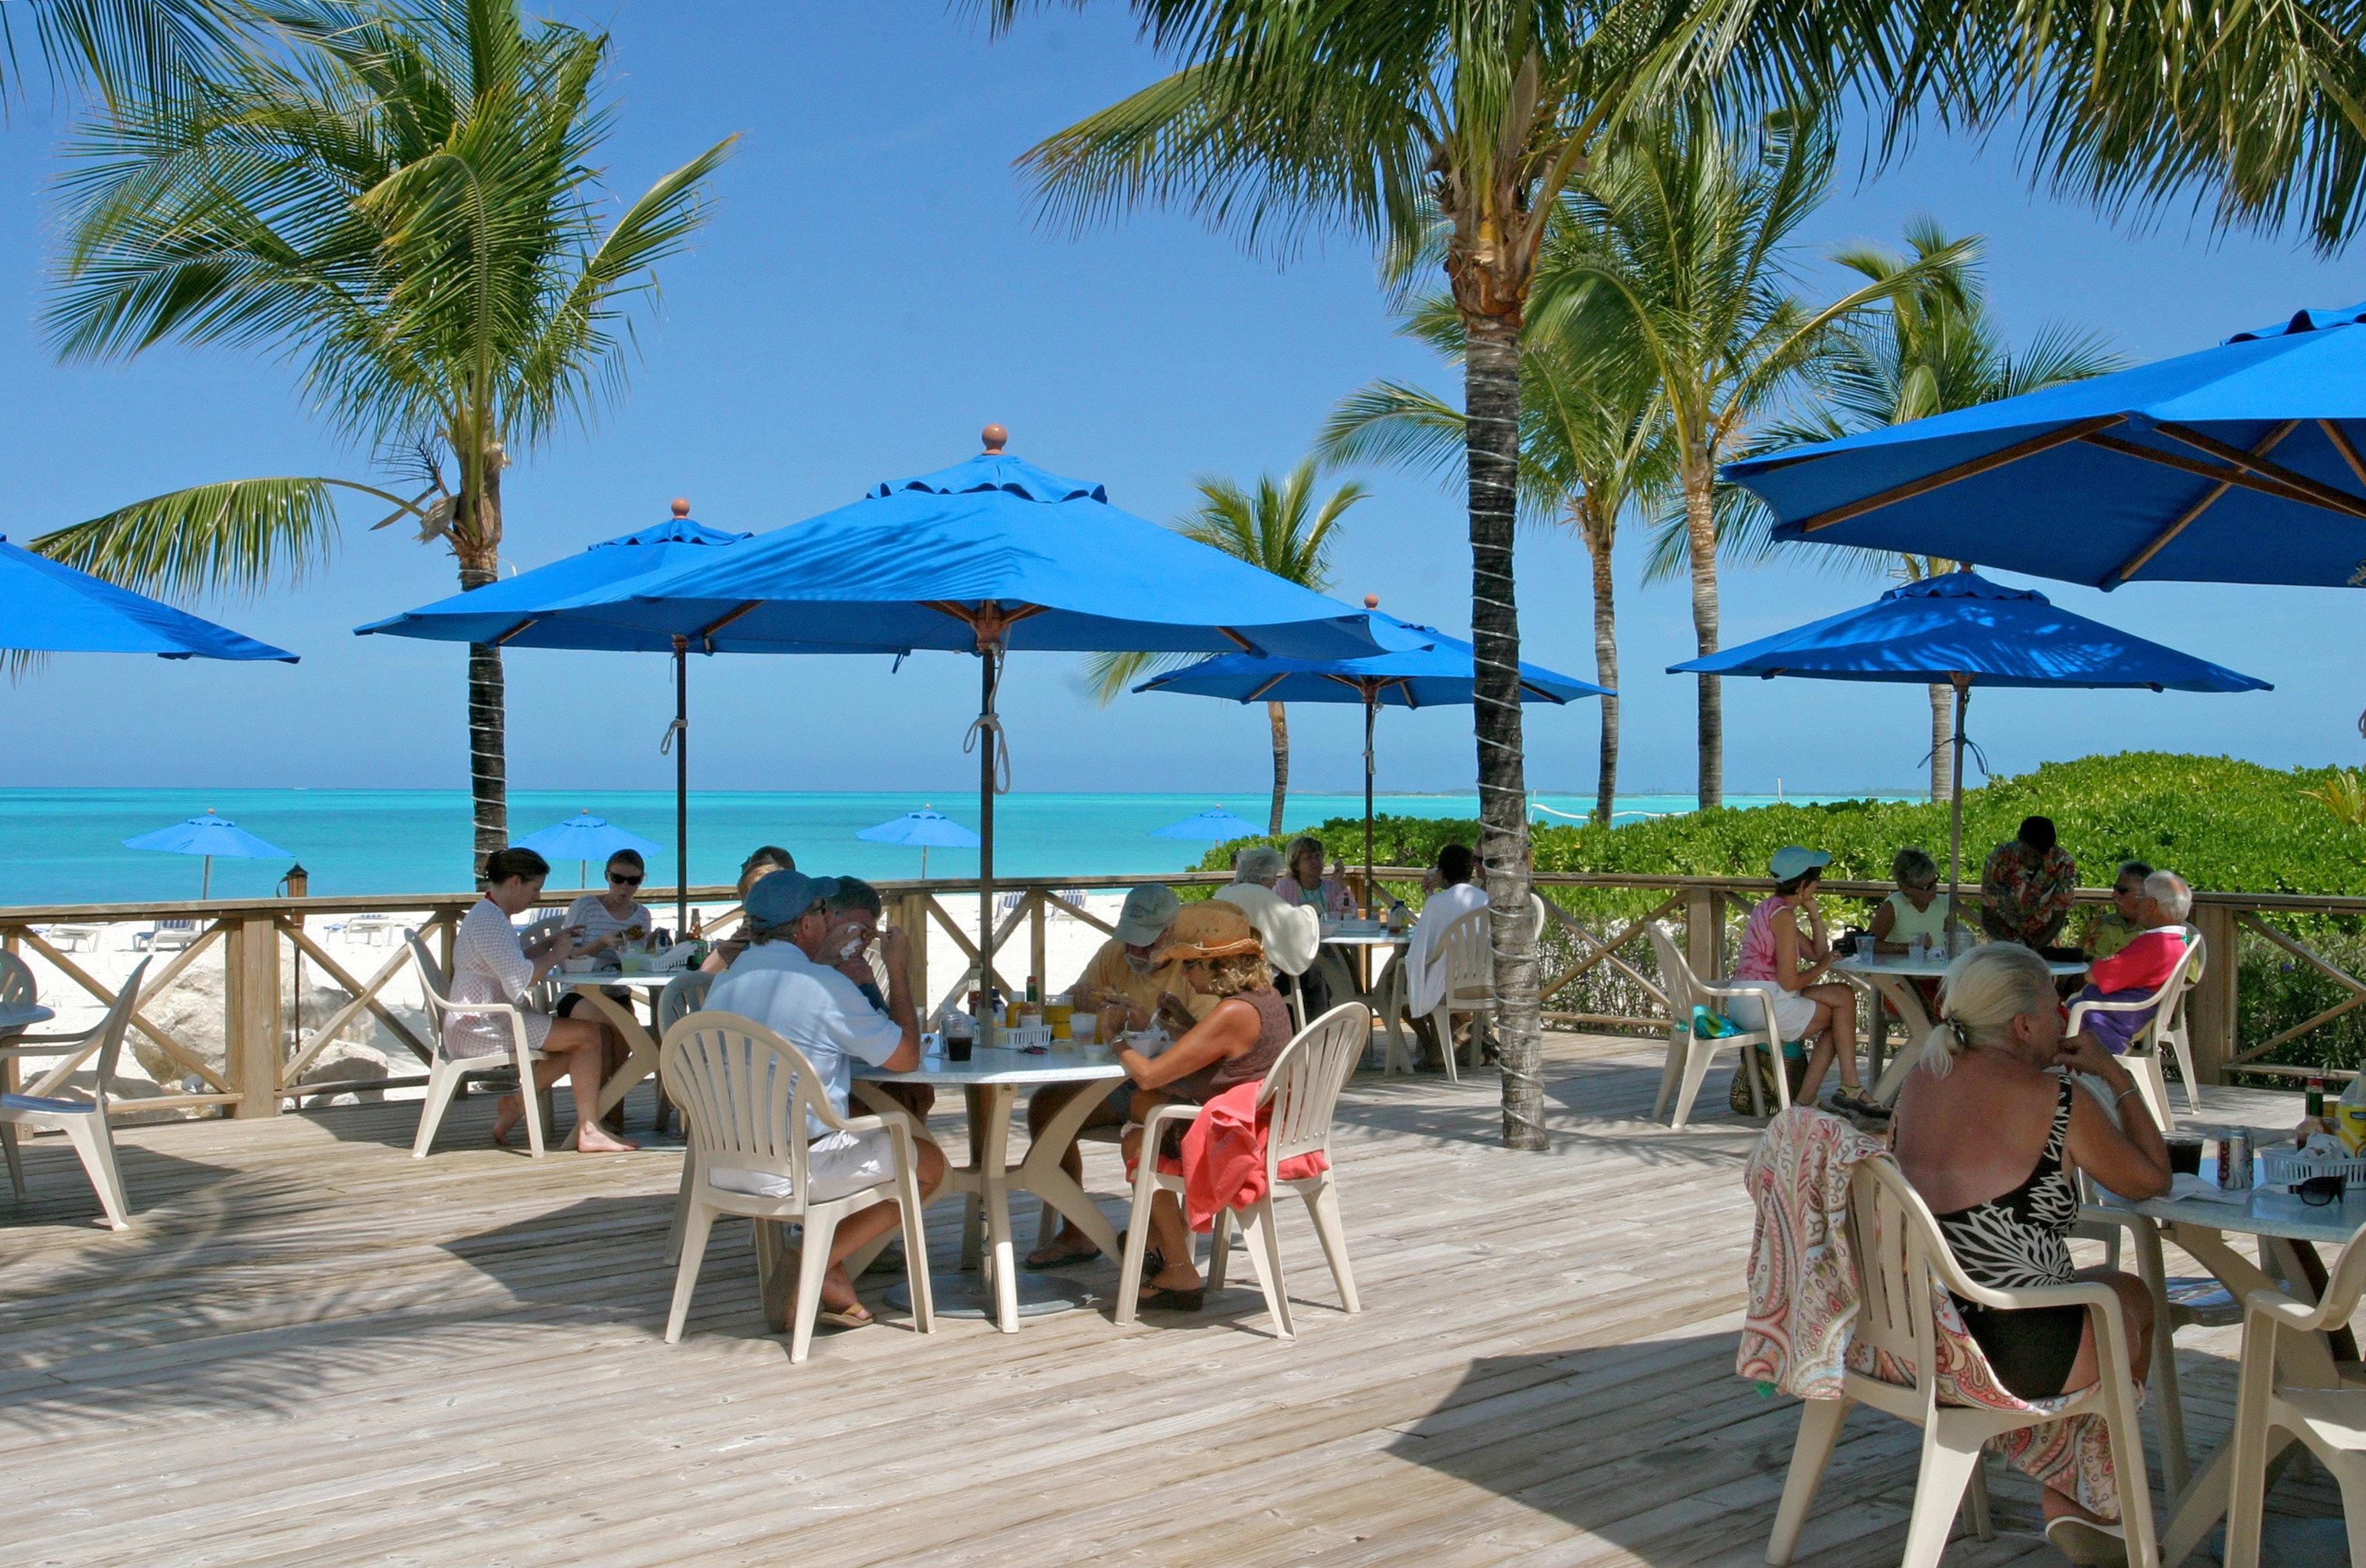 Beachfront Dining Drink Eat Grounds Resort tree sky umbrella chair ground leisure palm Beach caribbean walkway boardwalk Deck shade set shore